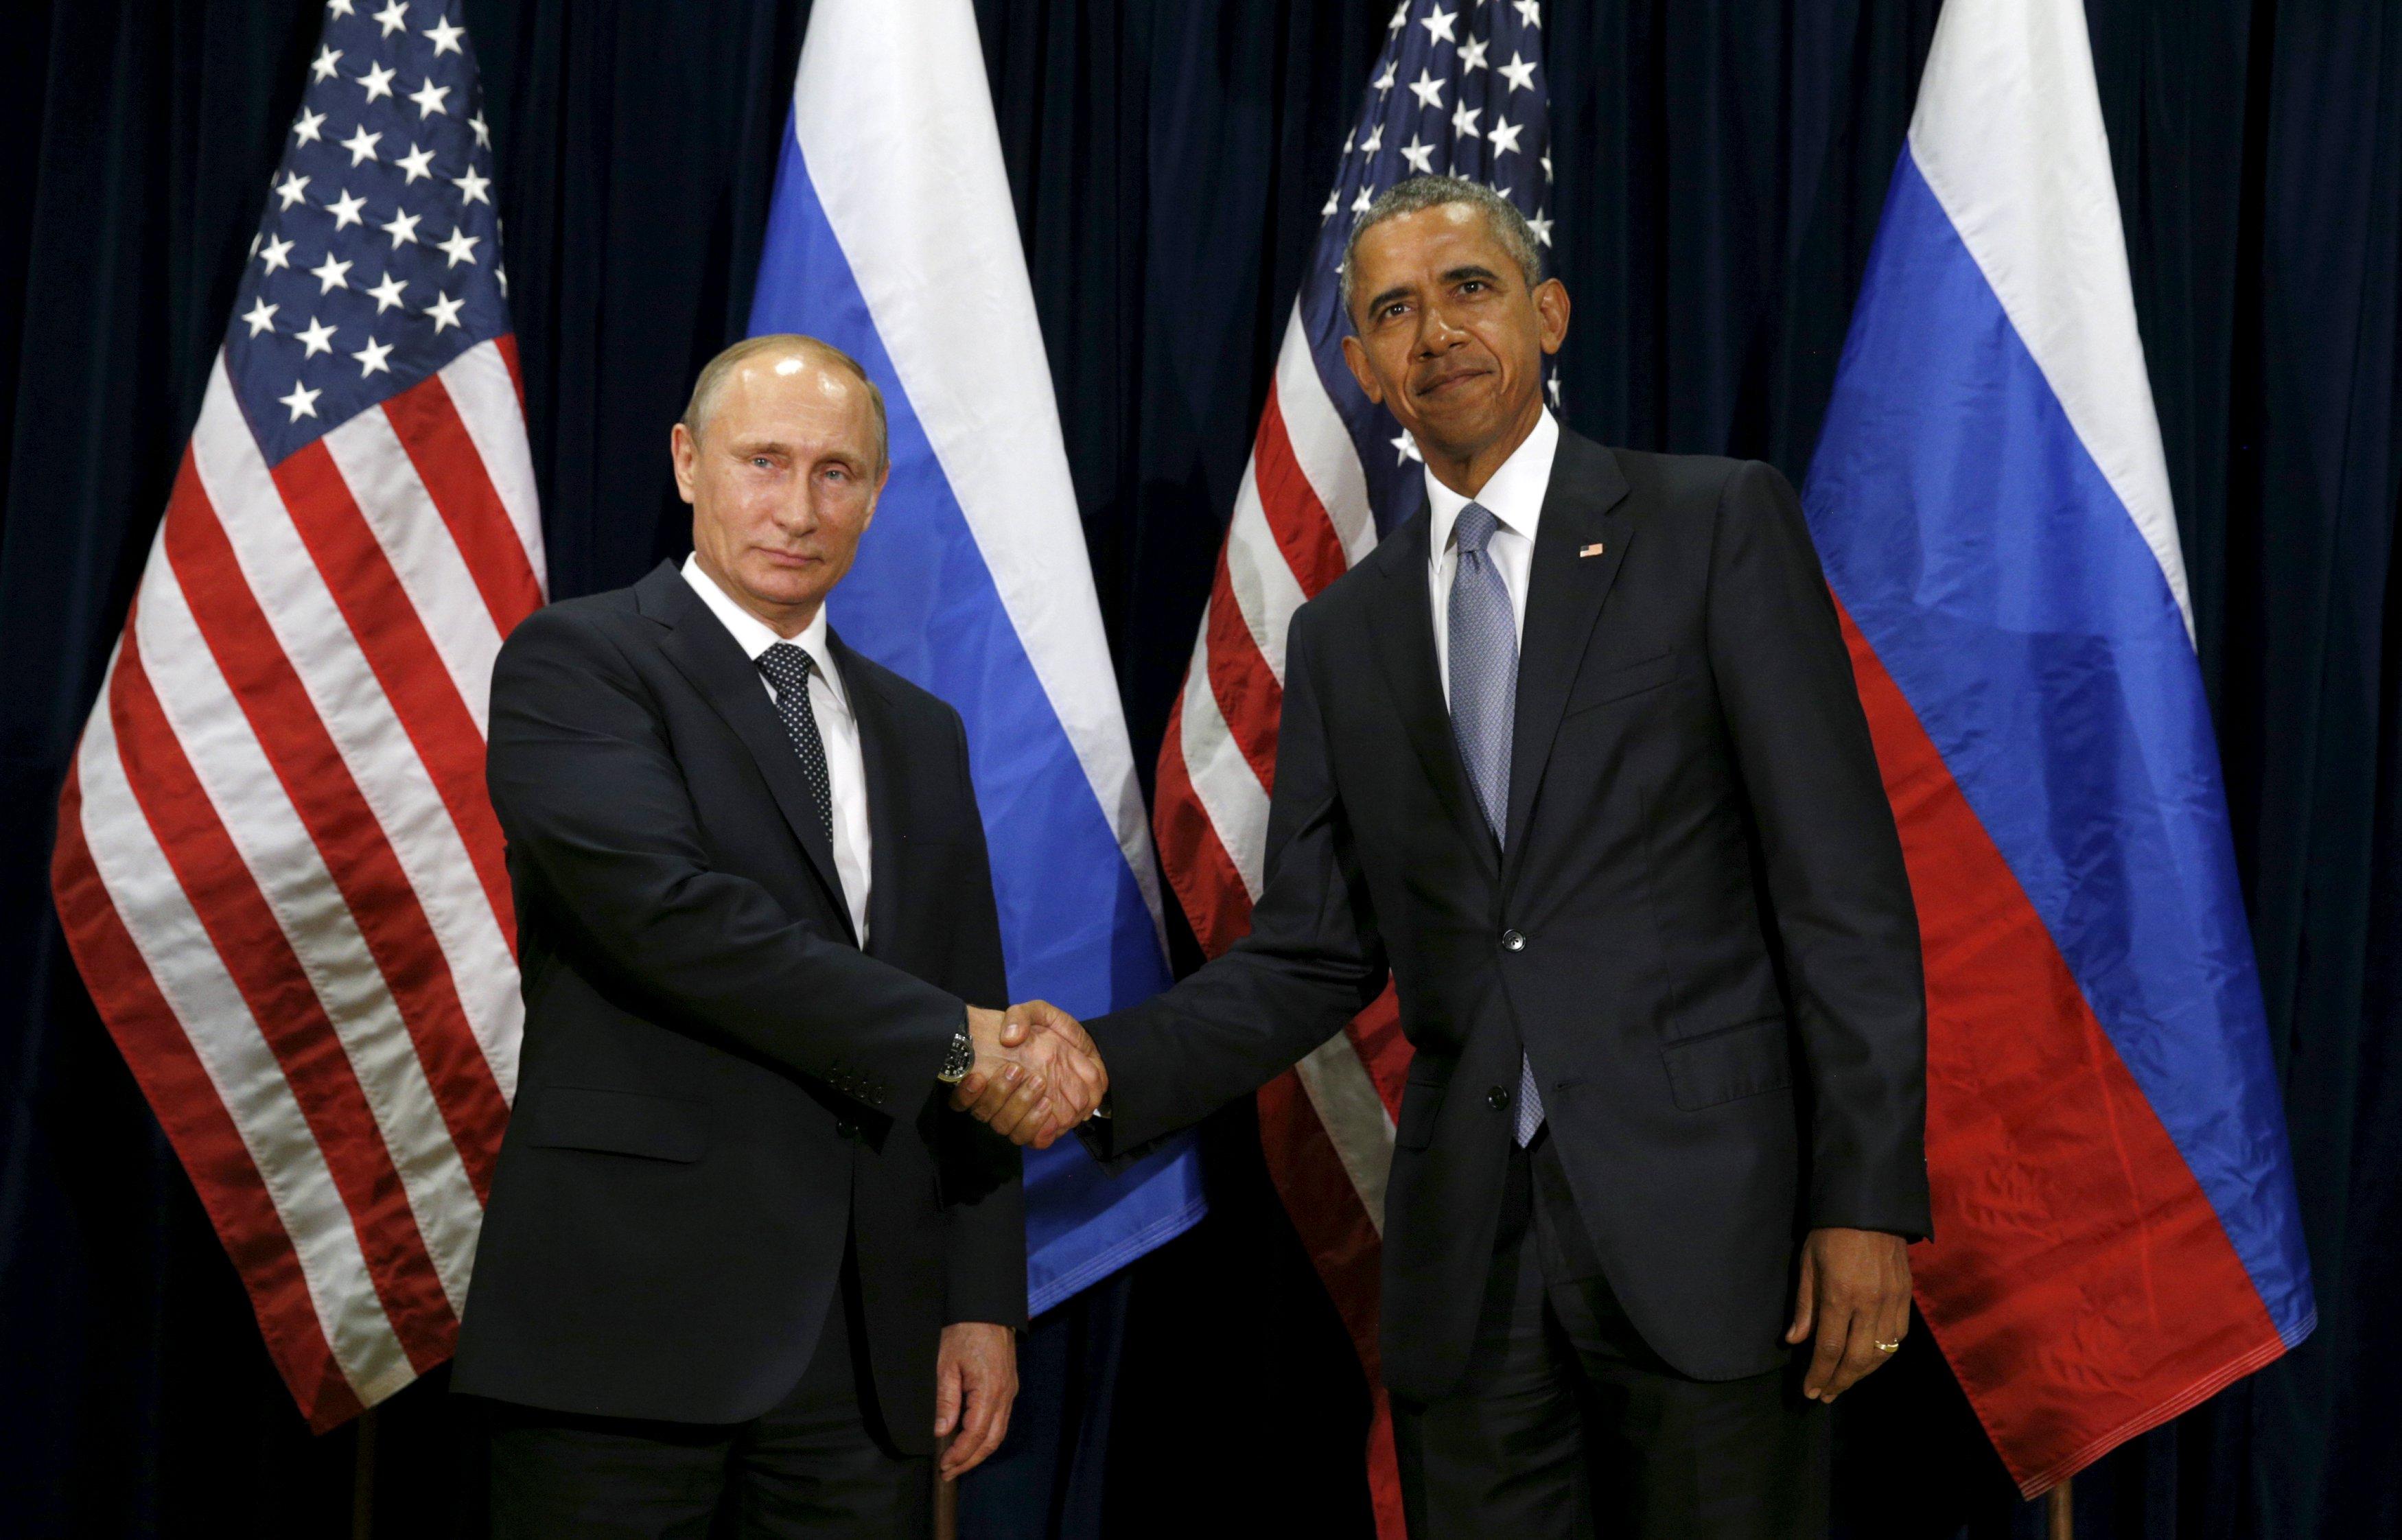 Сотрудничество запада и России